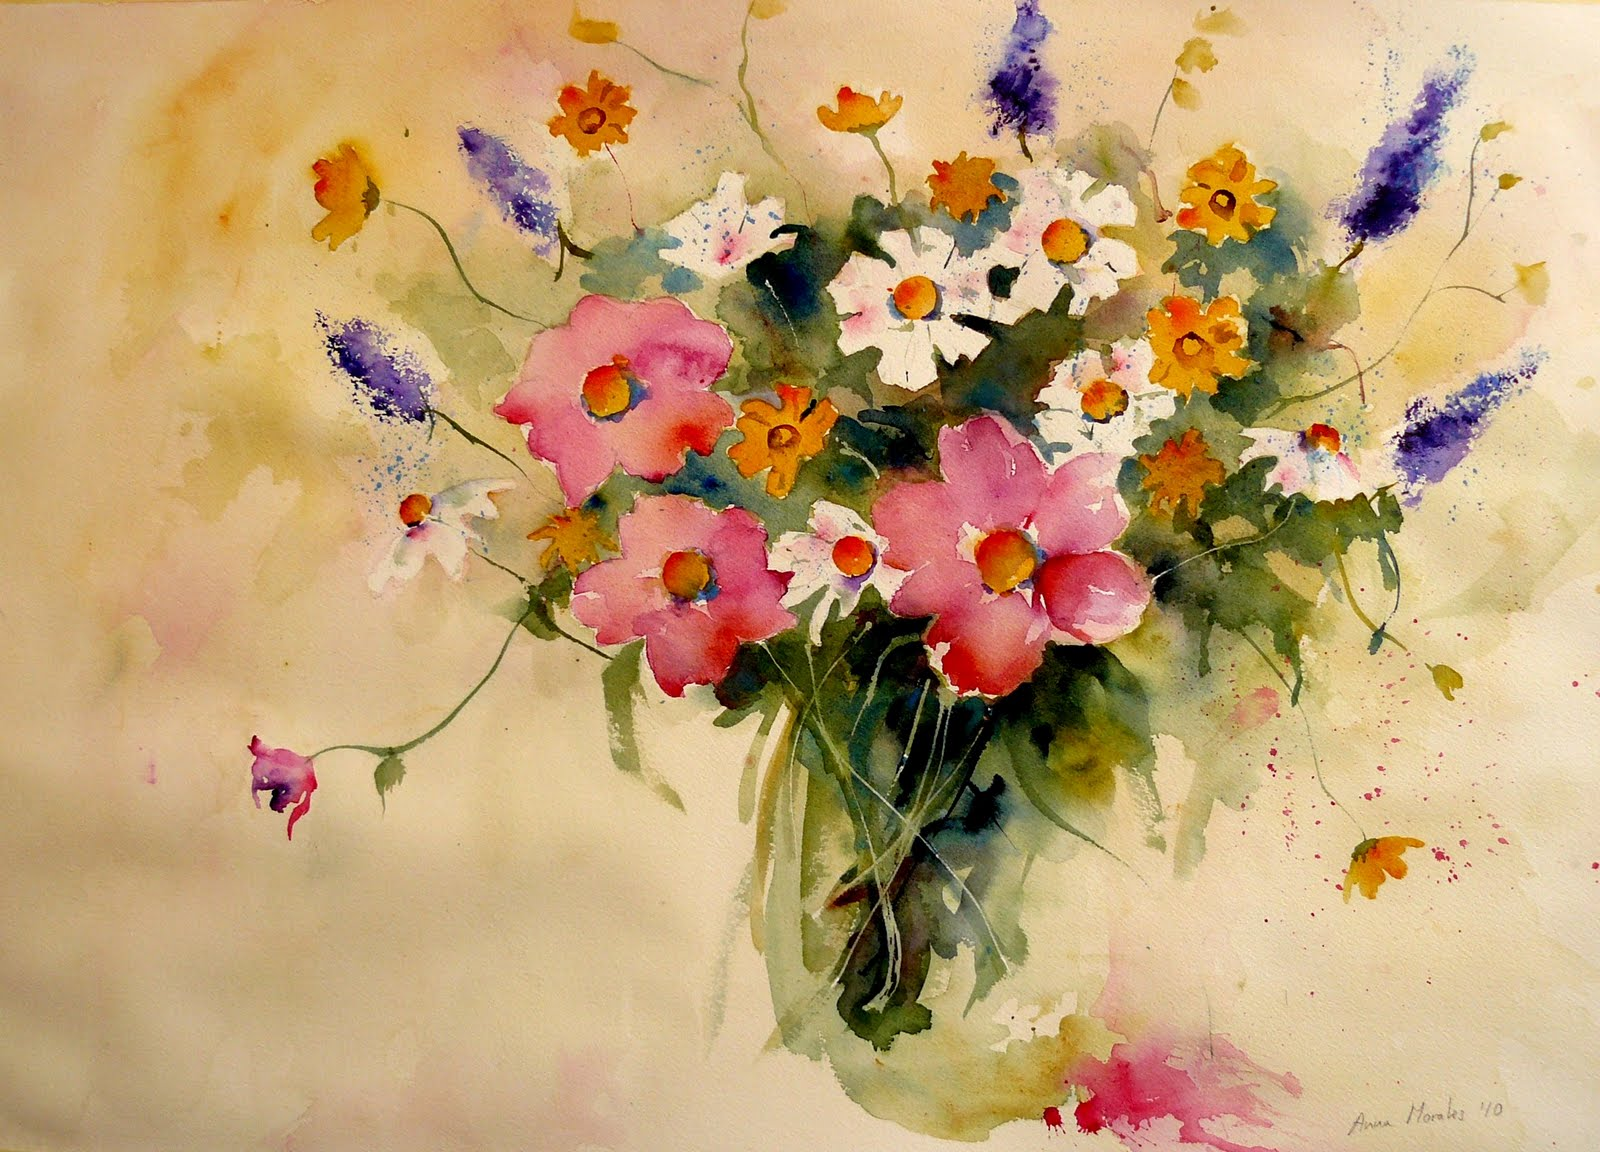 http://1.bp.blogspot.com/_Z4QC8ONRoCk/TDYdjzAB5OI/AAAAAAAACg4/5TcM7ZLicb4/s1600/Sempre+ens+quedaran+les+flors.jpg